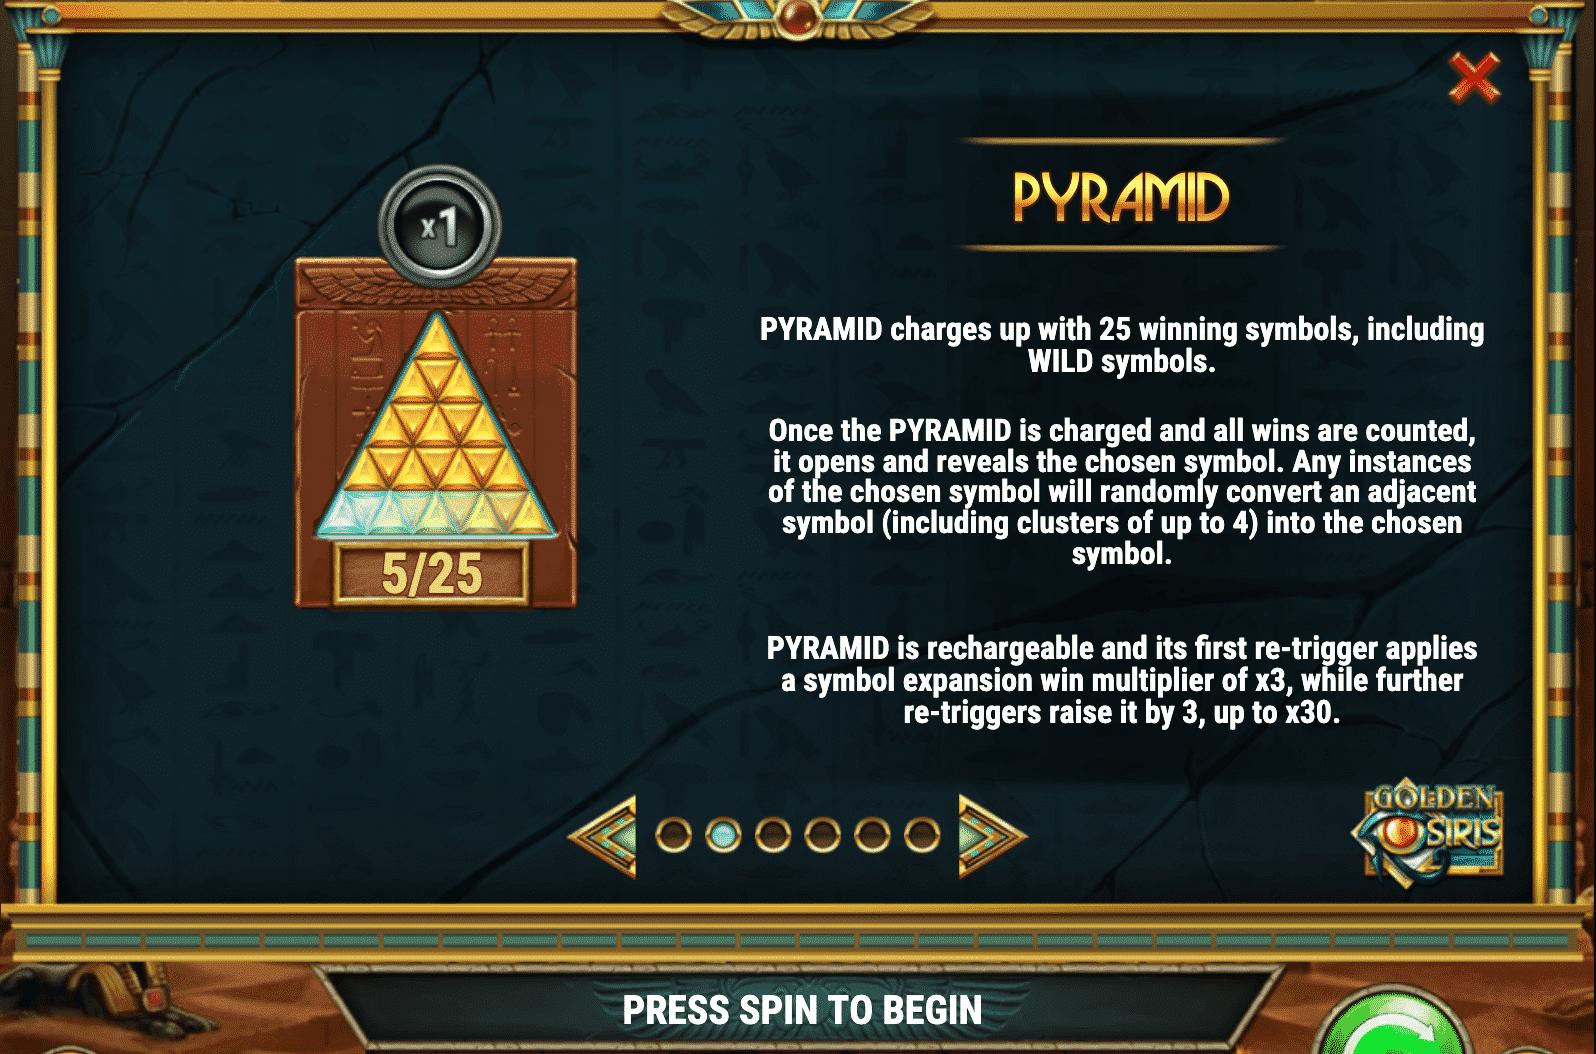 Golden Osiris Pyramid